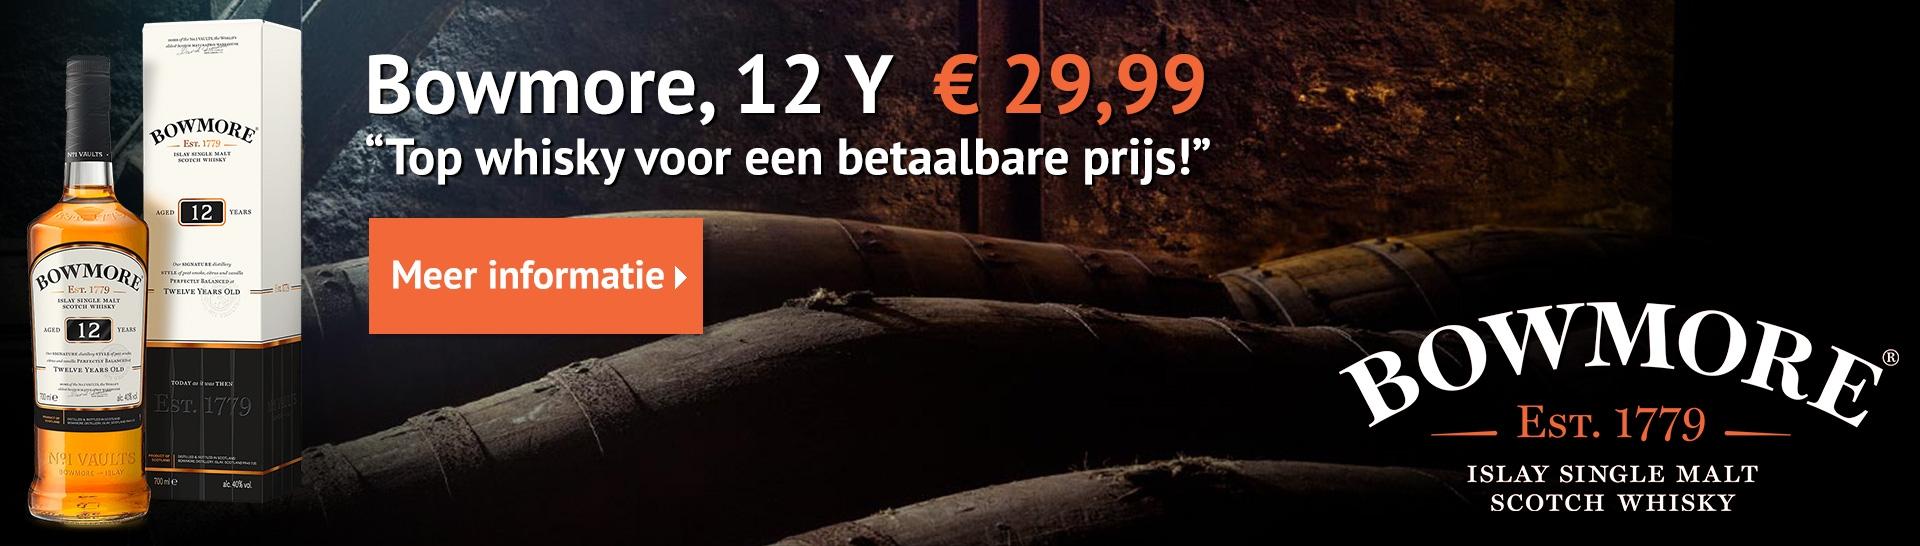 Whisky.nl Bowmore 12Y